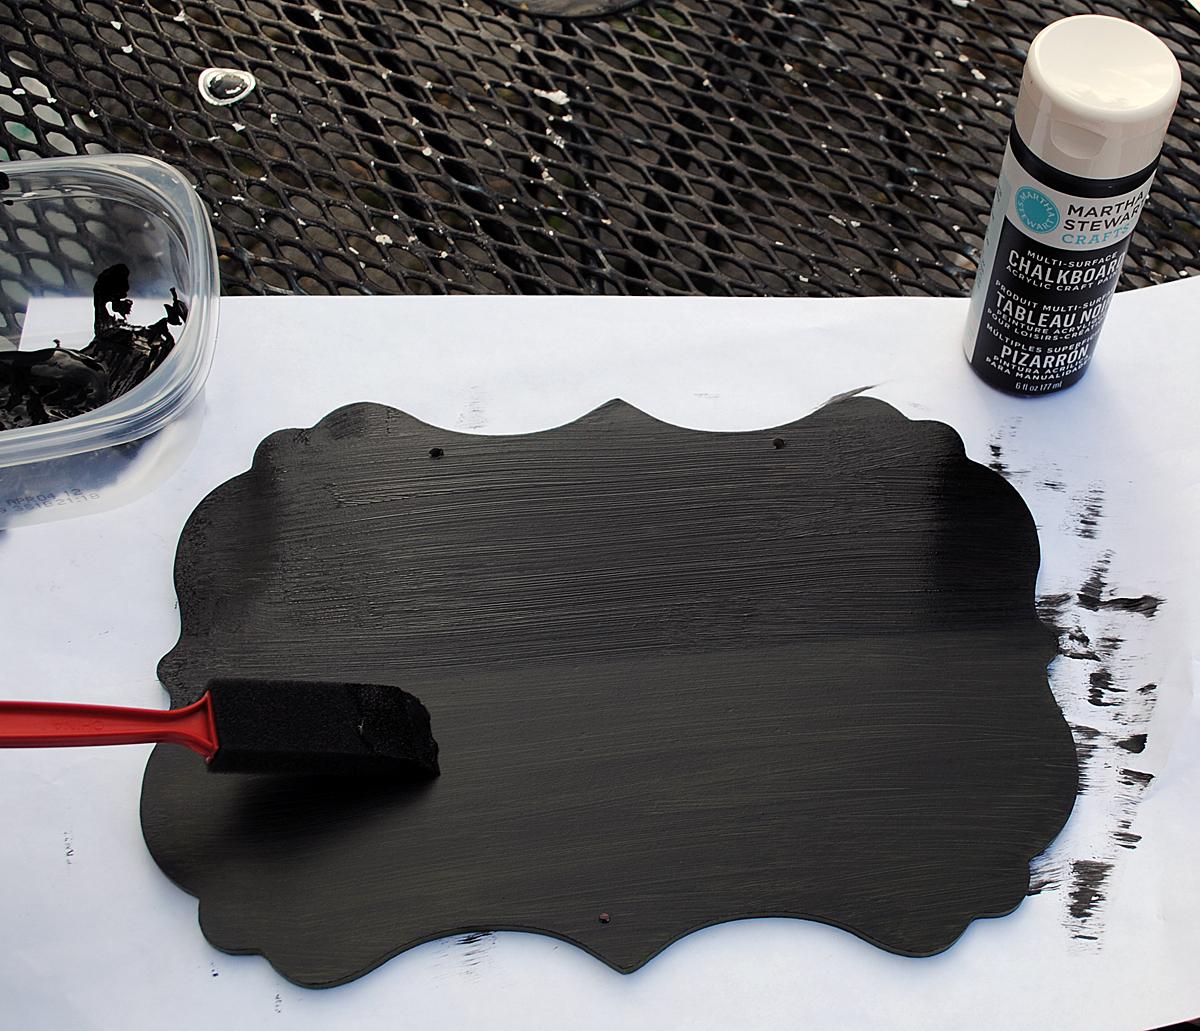 Chalkboard step1